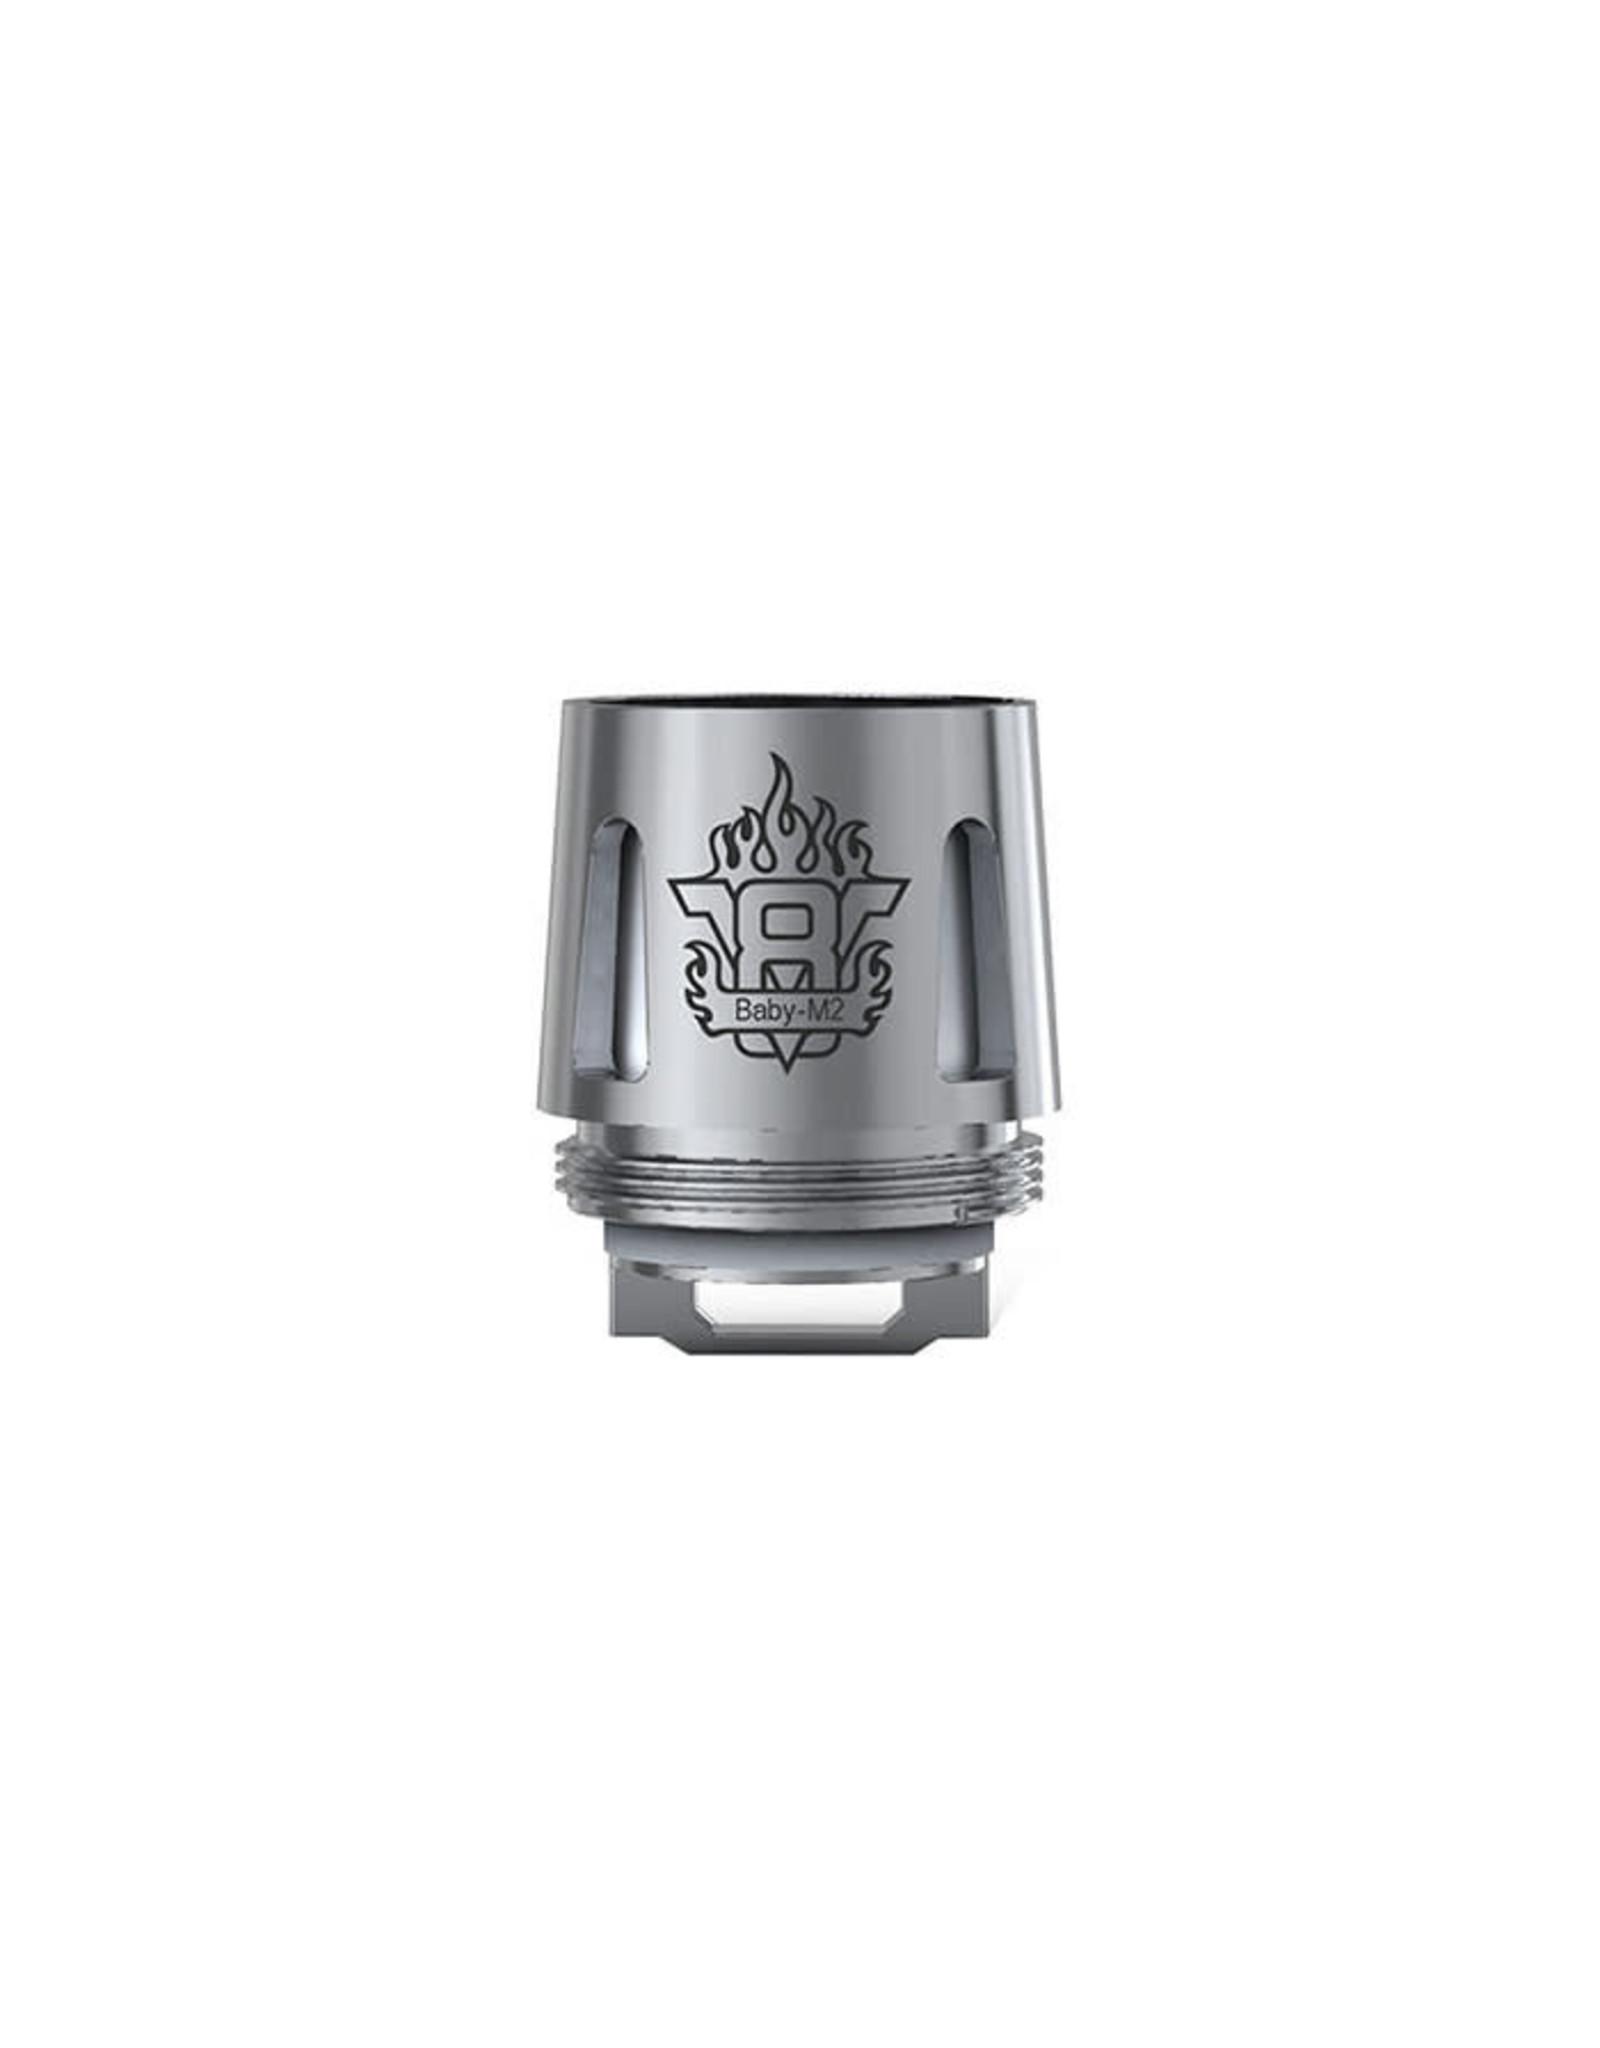 Smok Smok V8 Mini (TFV8 Baby Beast) Replacement Coils (5/Pk)